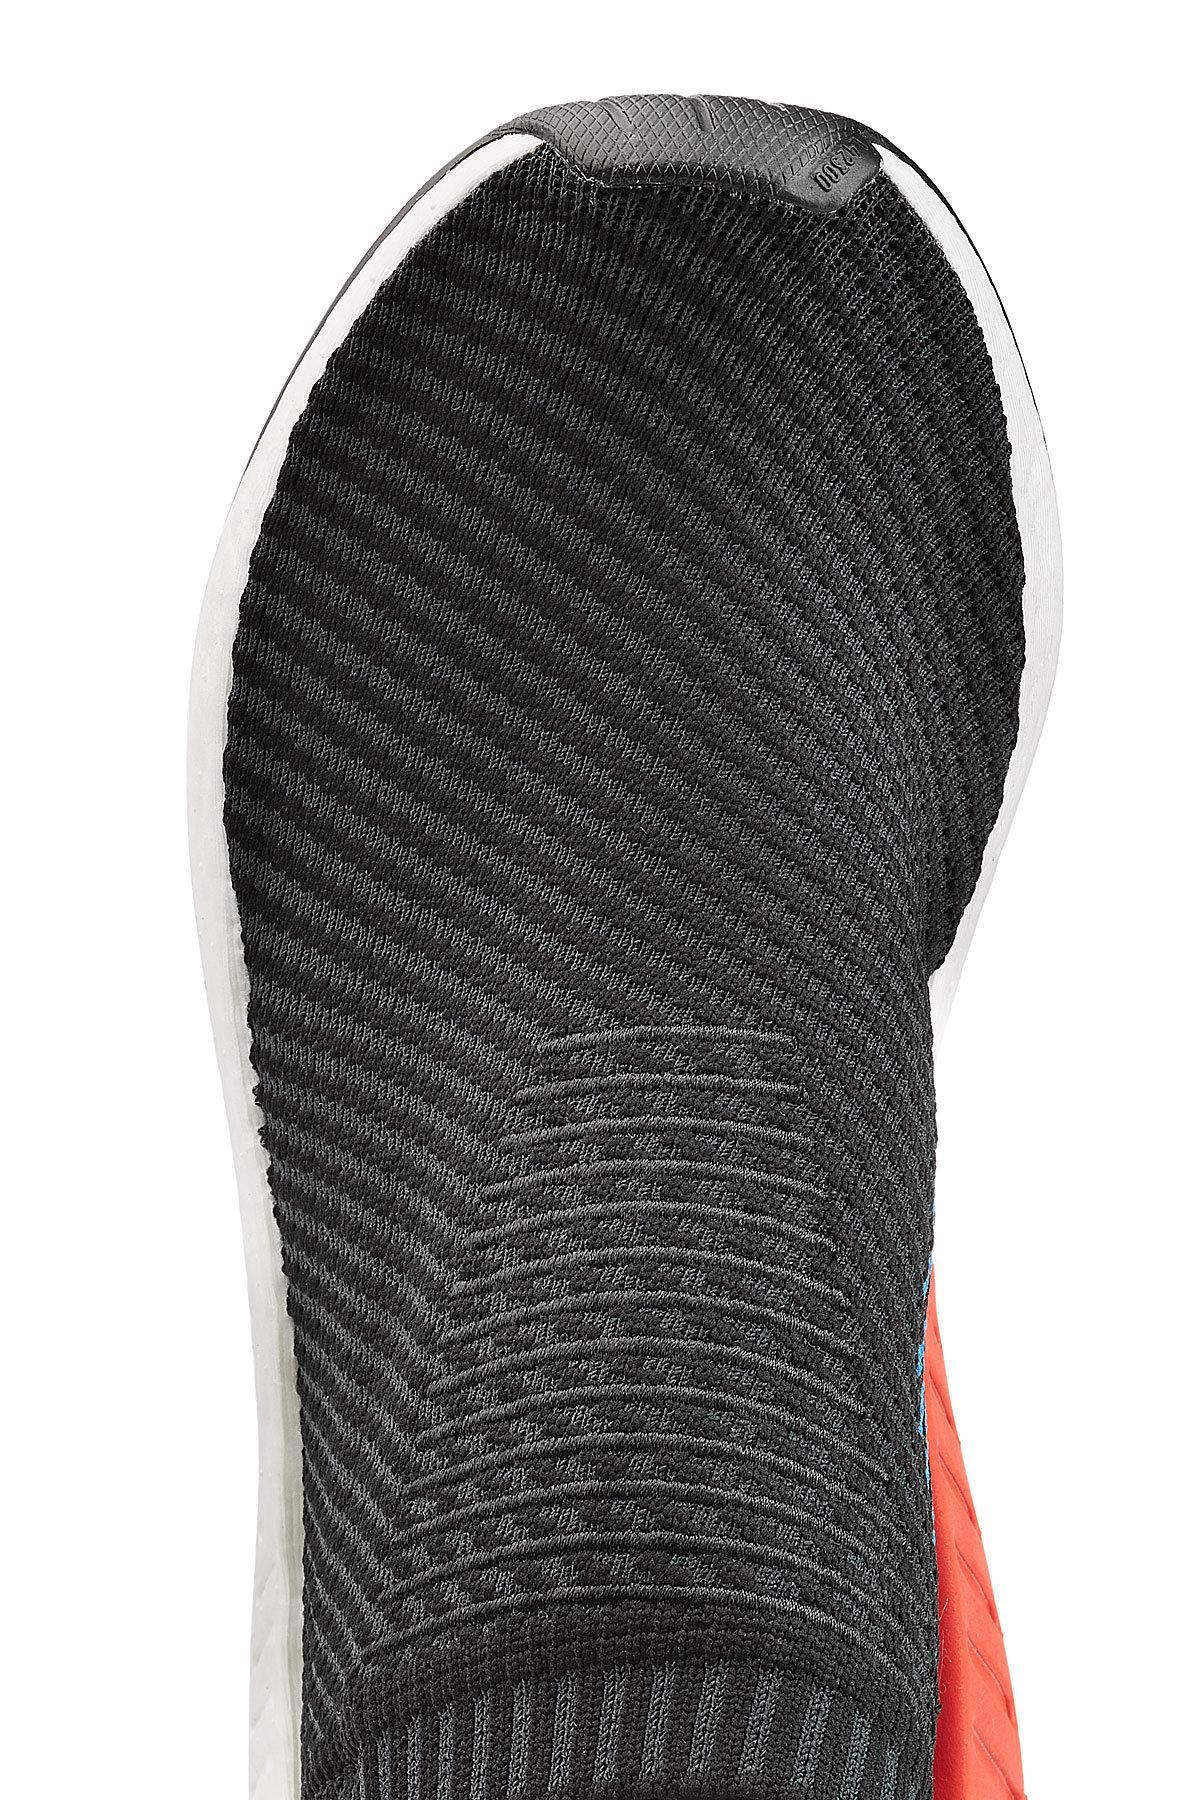 Lyst adidas Originals NMD CS2 primeknit zapatilla en negro para hombres